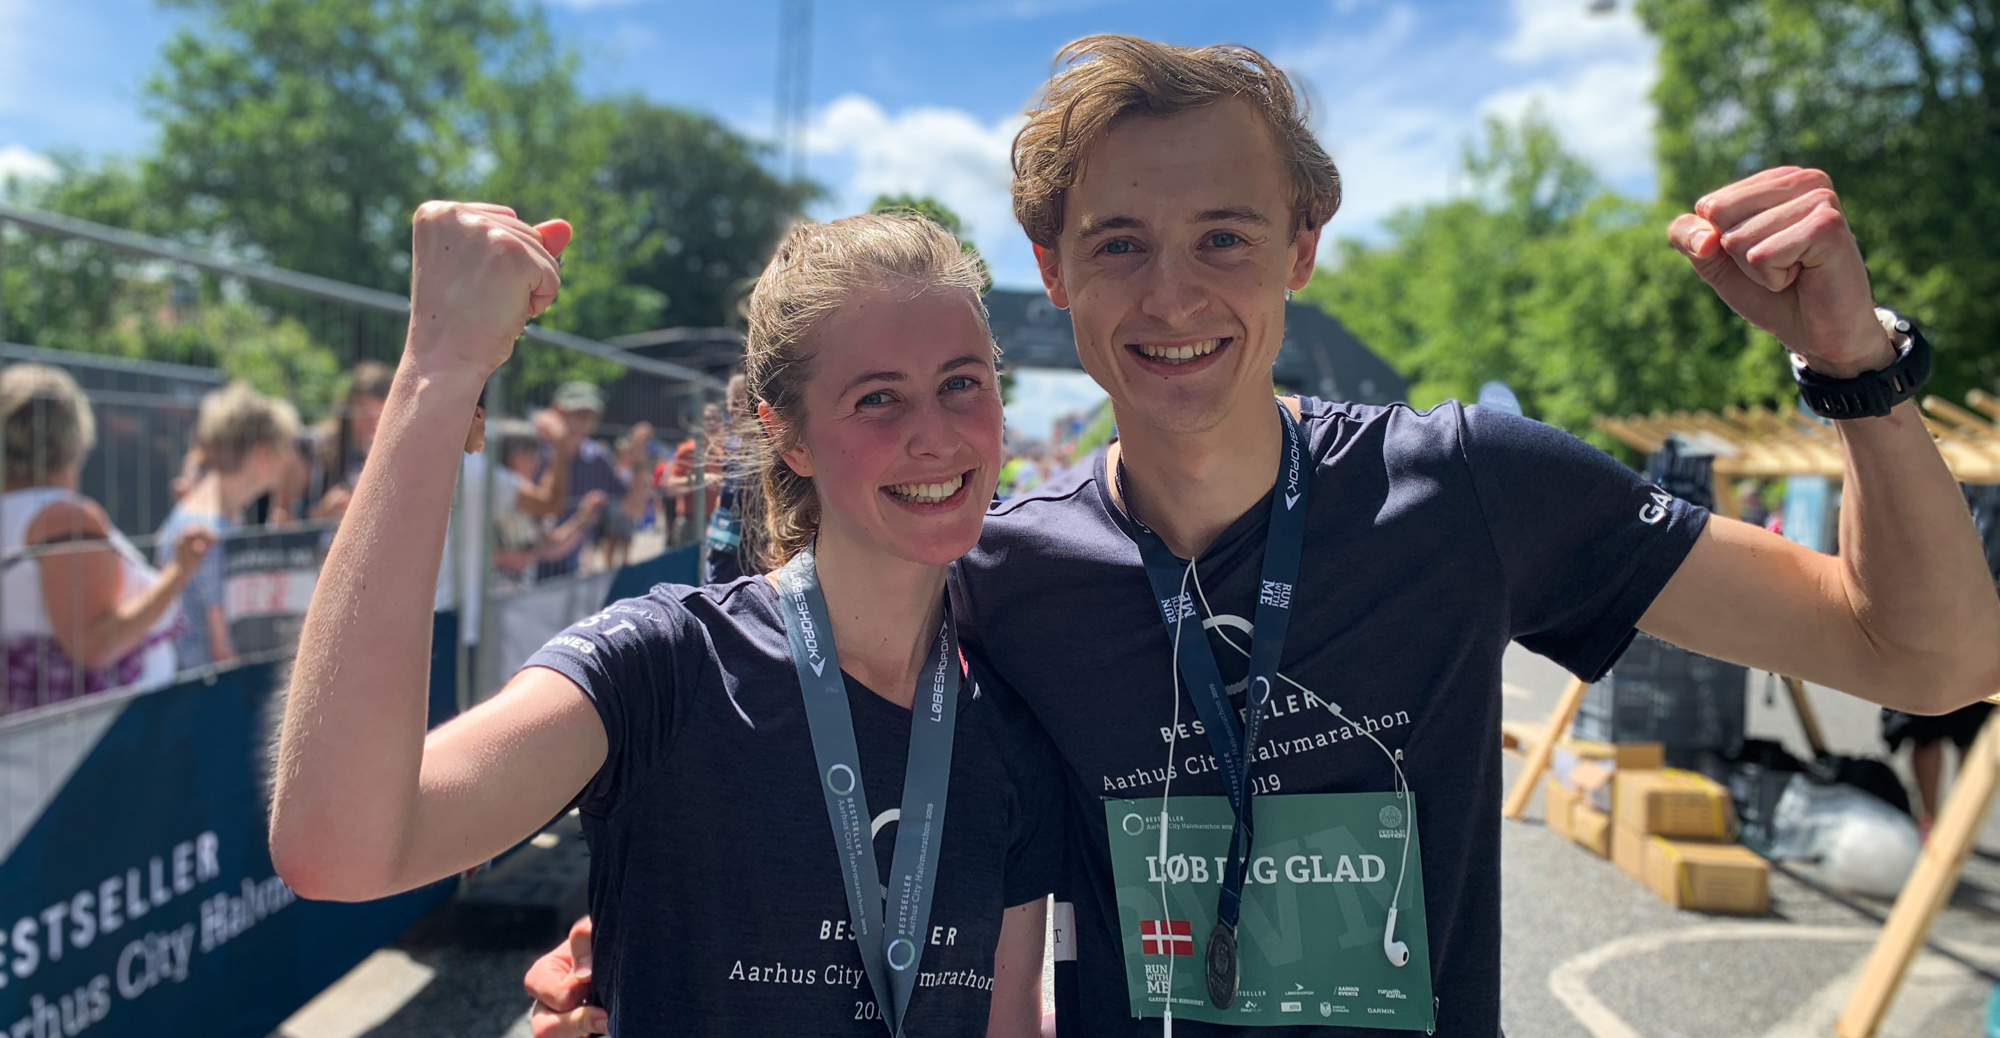 BESTSELLER Aarhus City Halvmarathon: Hele Aarhus festede med til årets halvmarathon